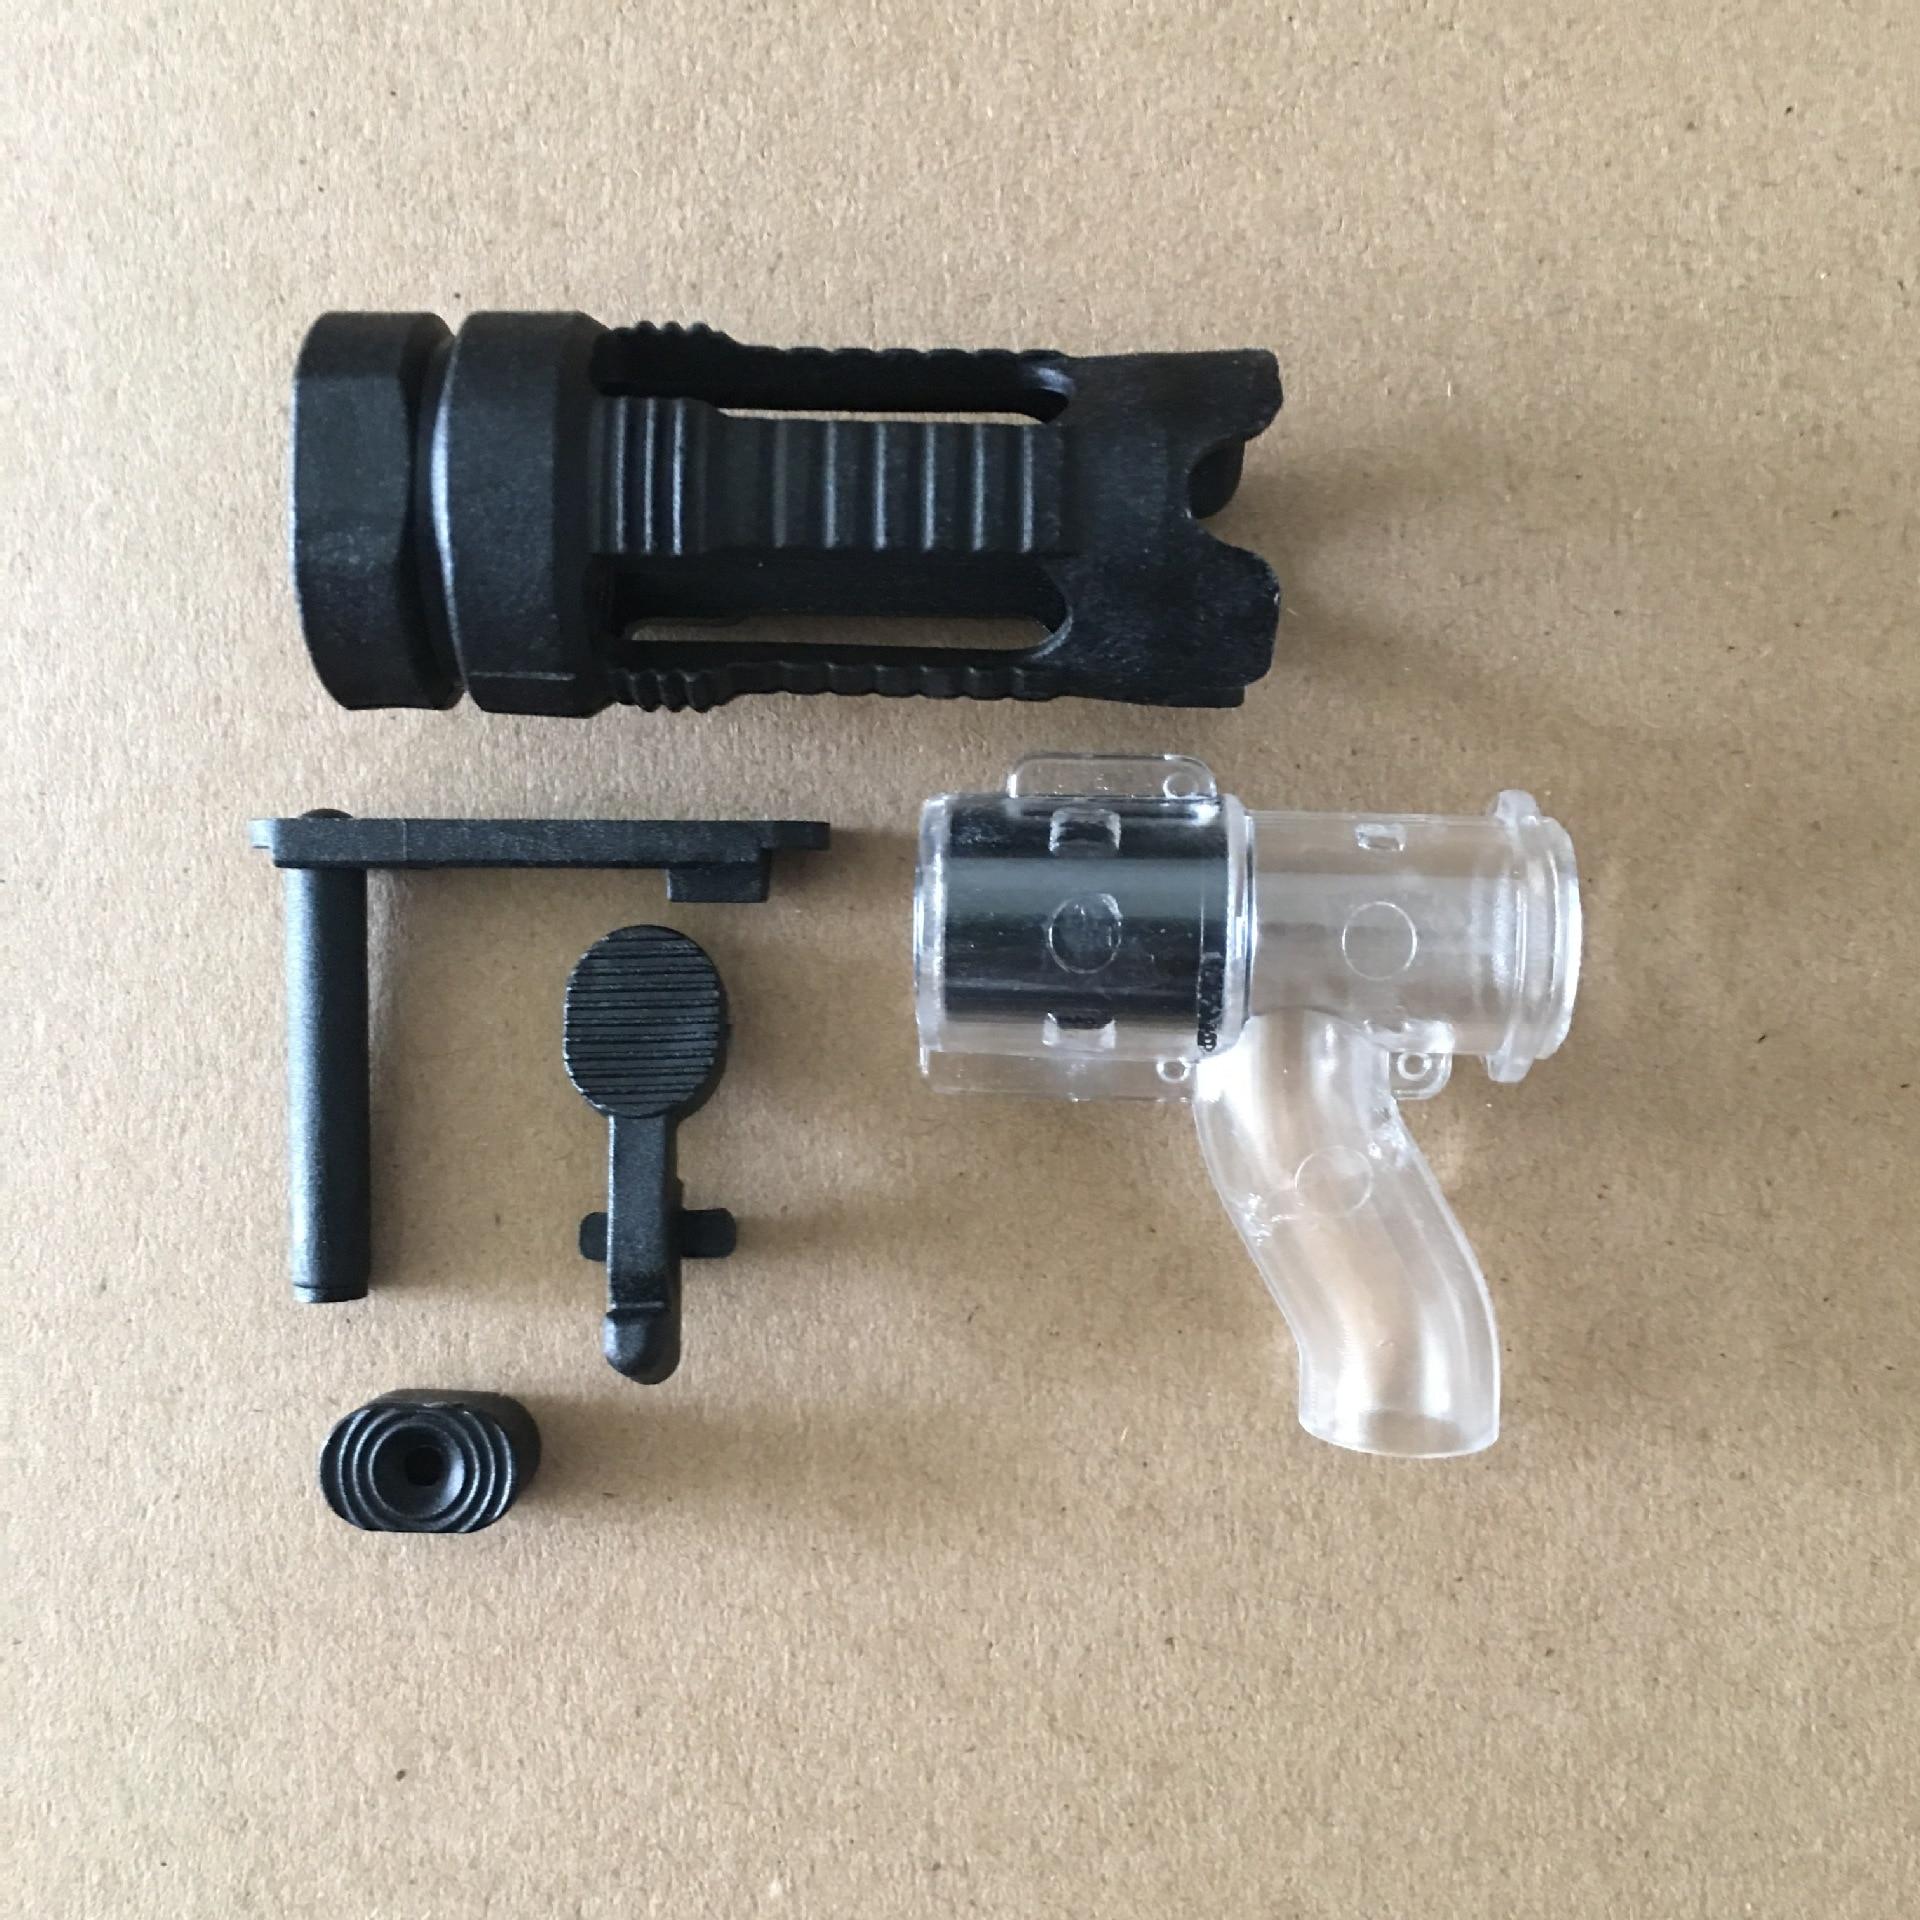 Jinming 9thThree-tee 9 Generation Black Accessories M4A1 Gearbox Water Bullet Gel Blaster Children's Toy Gun Accessories